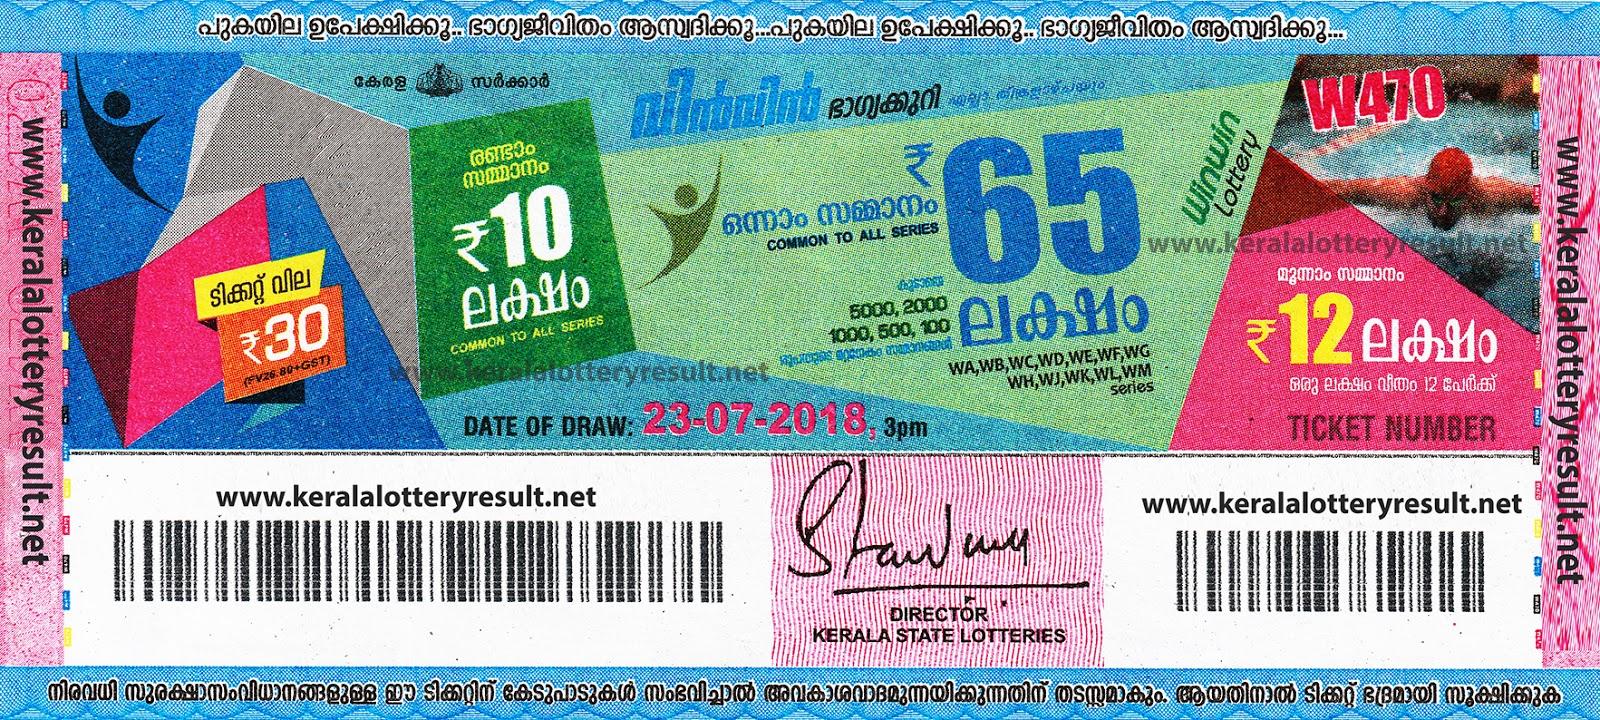 Kerala lottery ticket result win